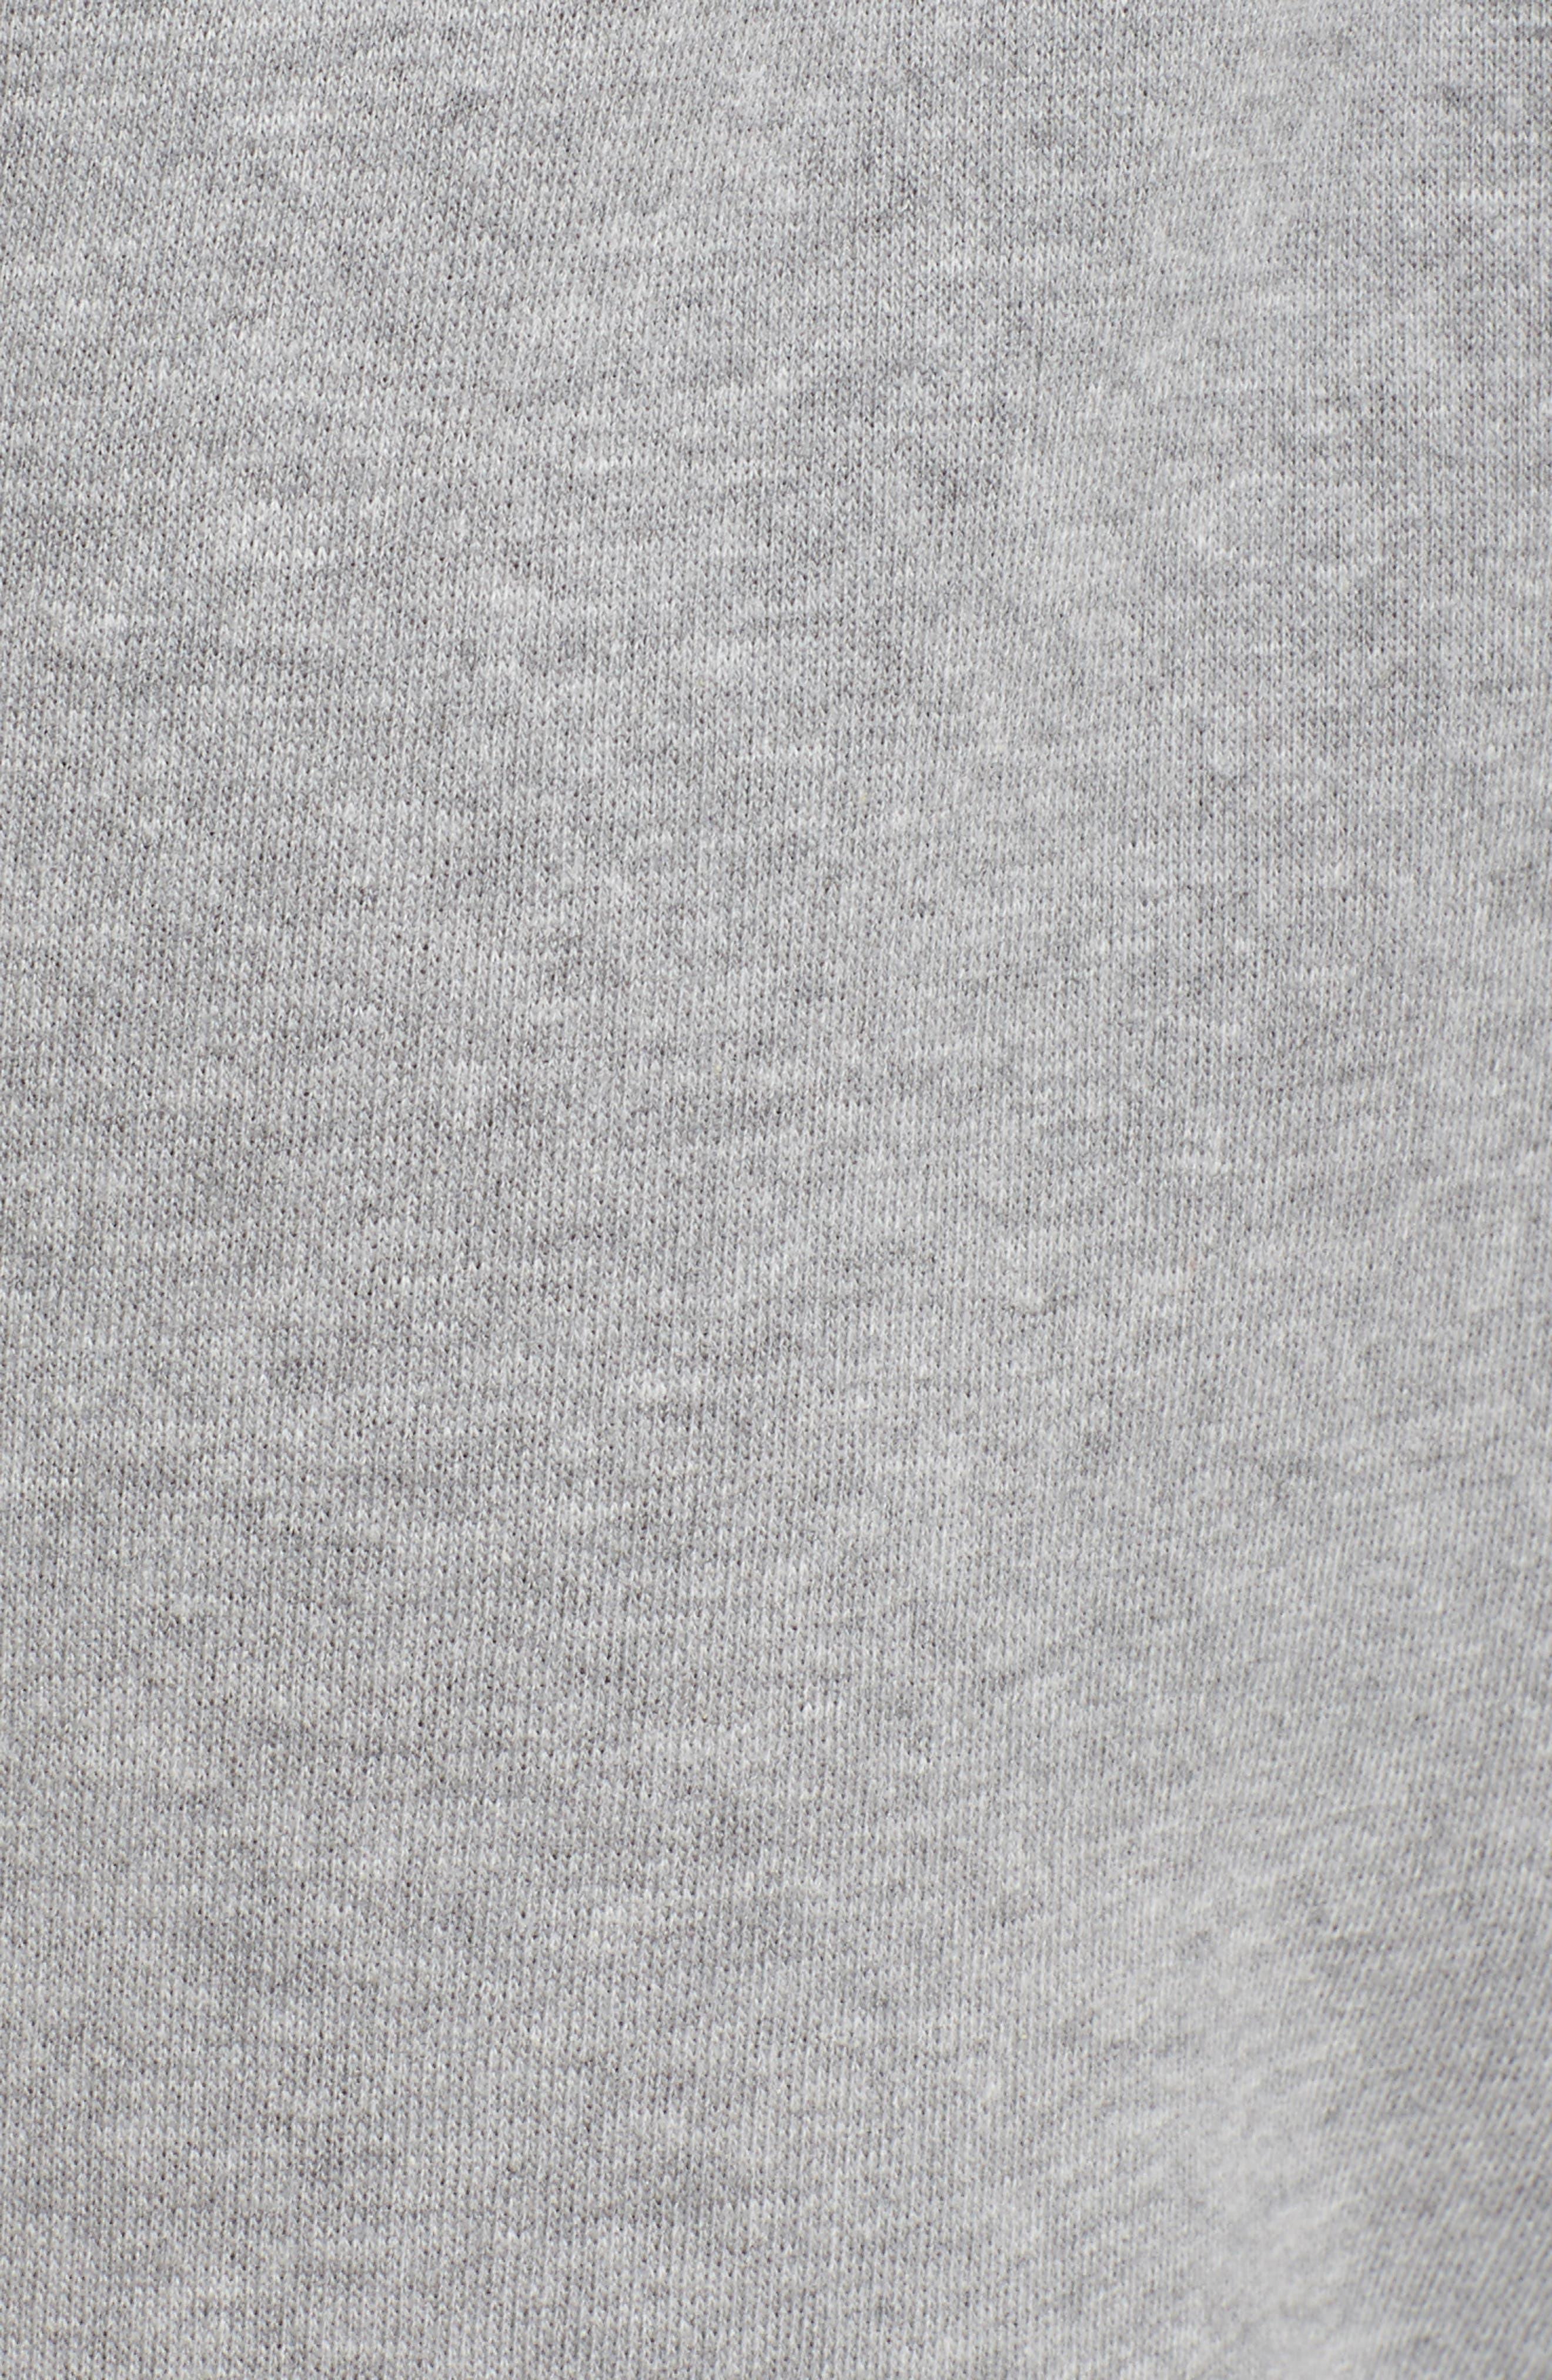 Lounge Pants,                             Alternate thumbnail 5, color,                             Heather Grey